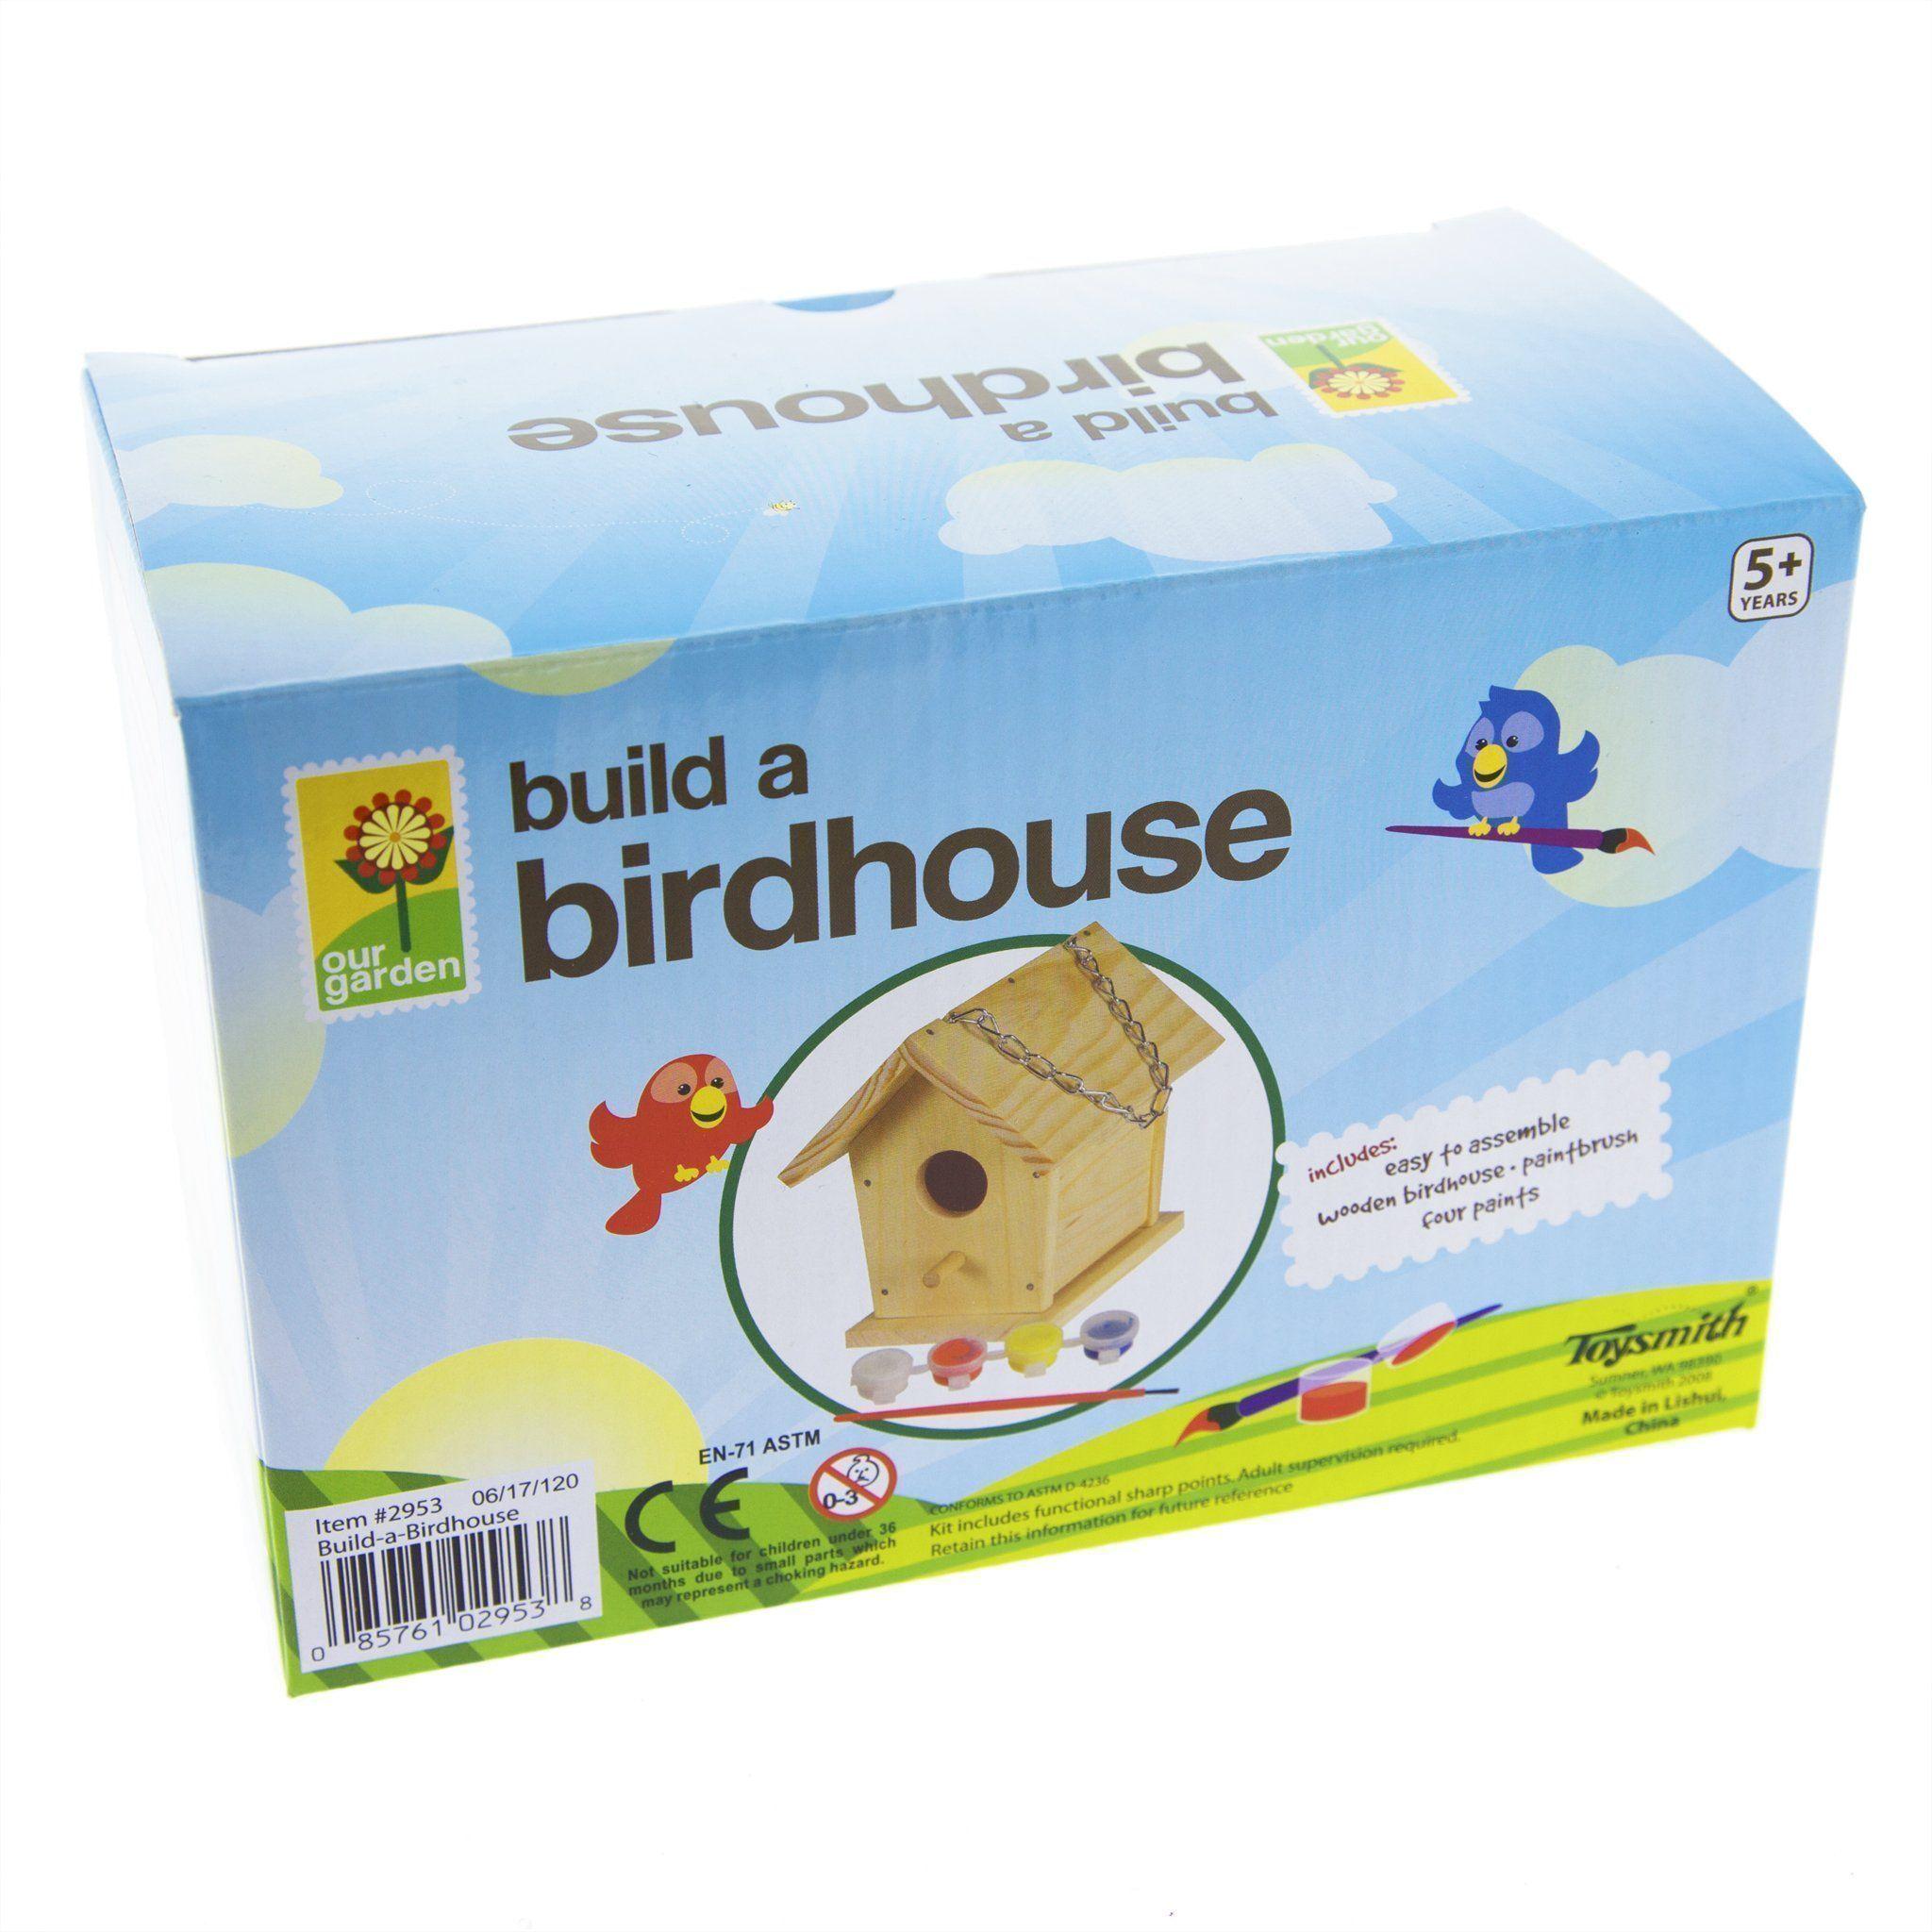 Build A Birdhouse #buildabirdhouse